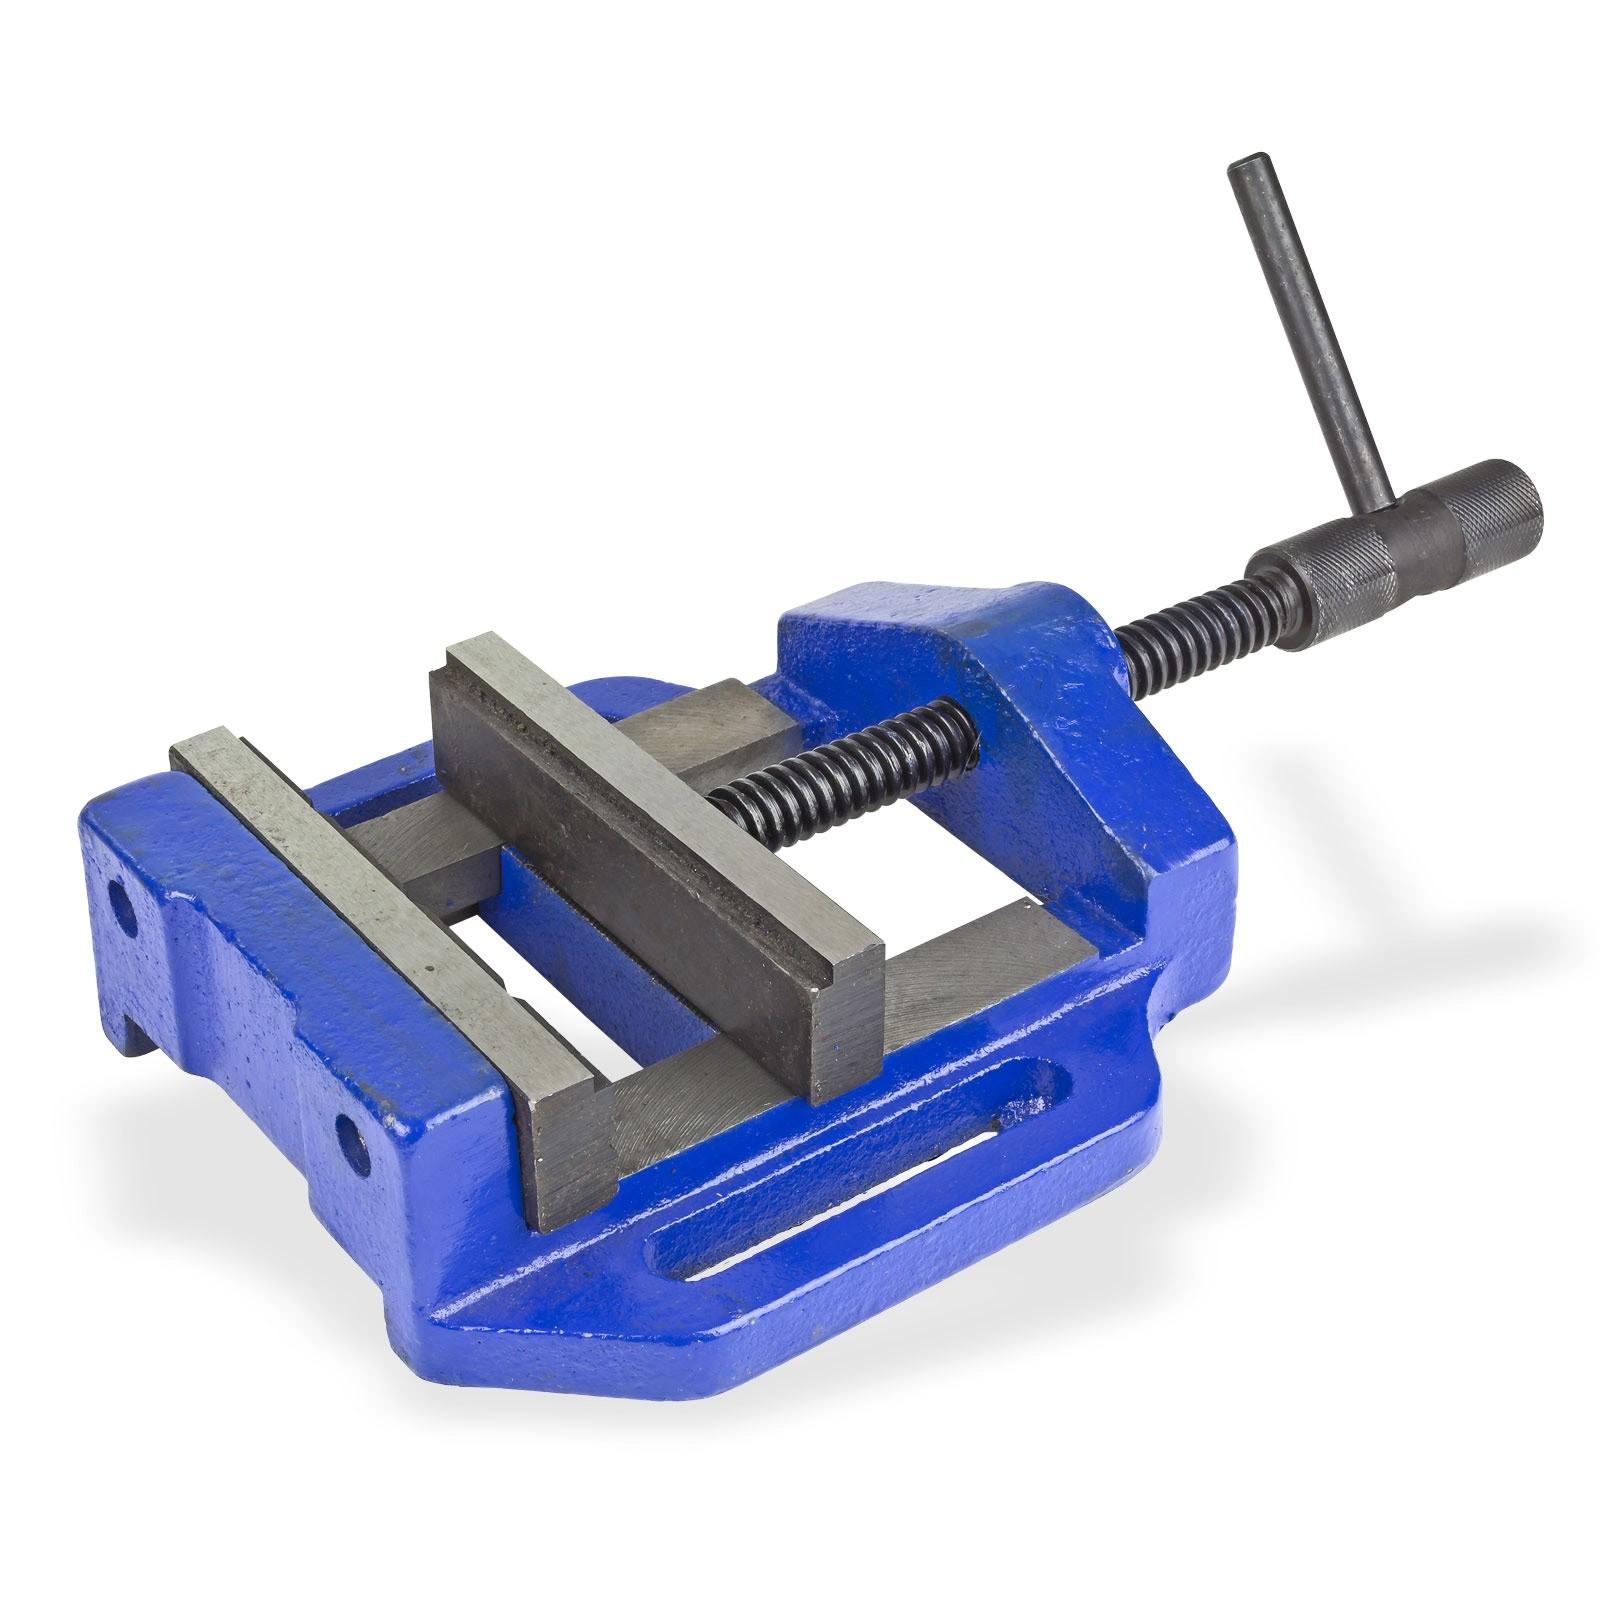 Dema Maschinenschraubstock Schraubstock Basic Tischbohrmaschine Säulenbohrmaschine 20127